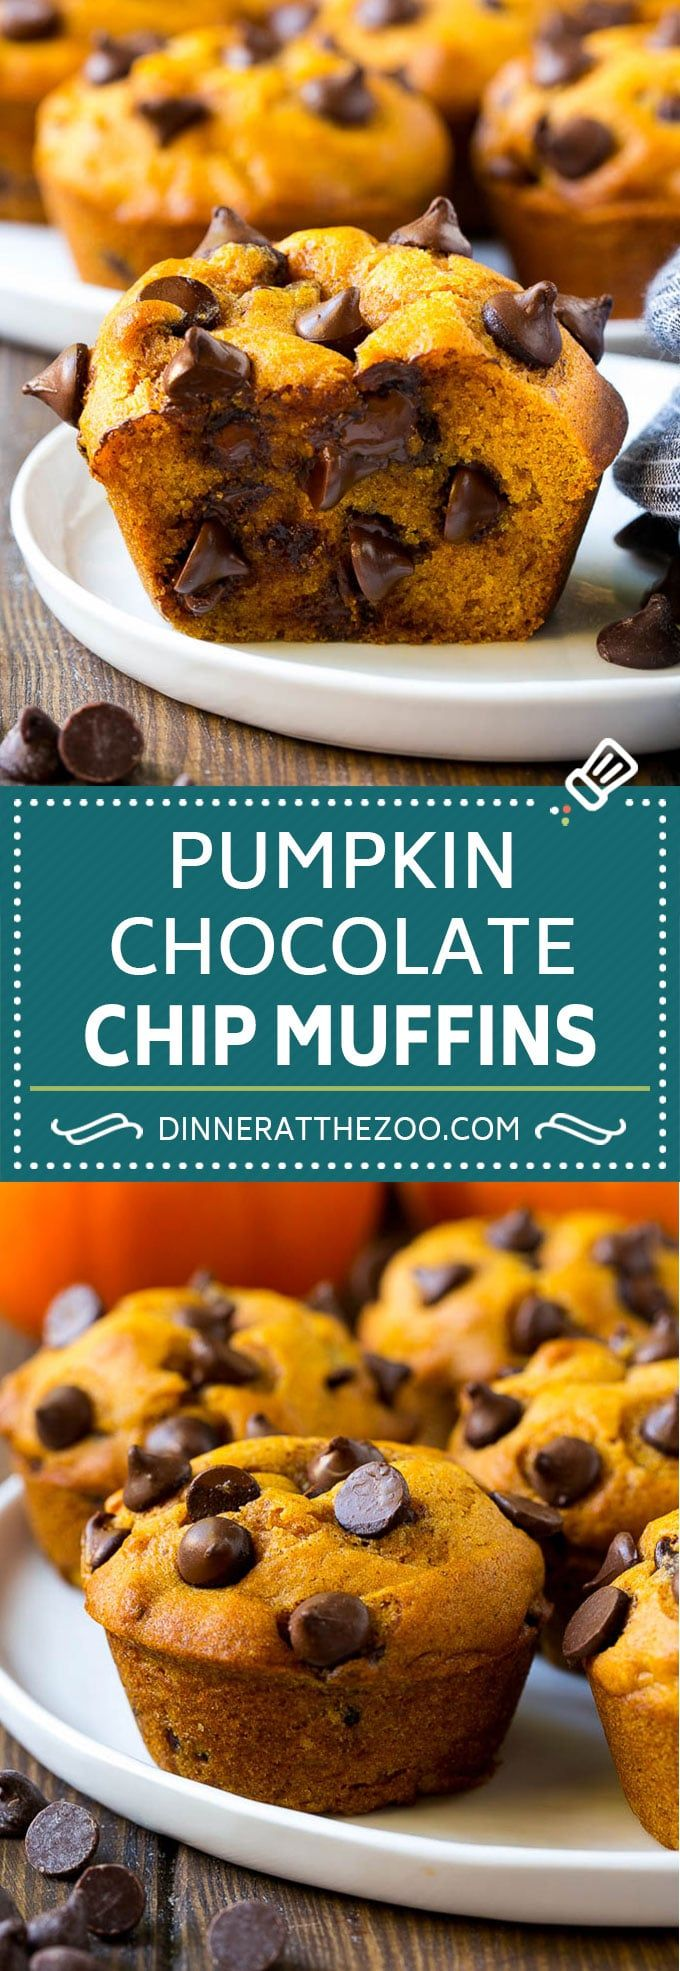 Pumpkin Chocolate Chip Muffins Recipe   Pumpkin Muffins   Chocolate Pumpkin Muffins #muffins #pumpkin #fall #chocolate #dessert #snack #dinneratthezoo #pumpkinmuffins